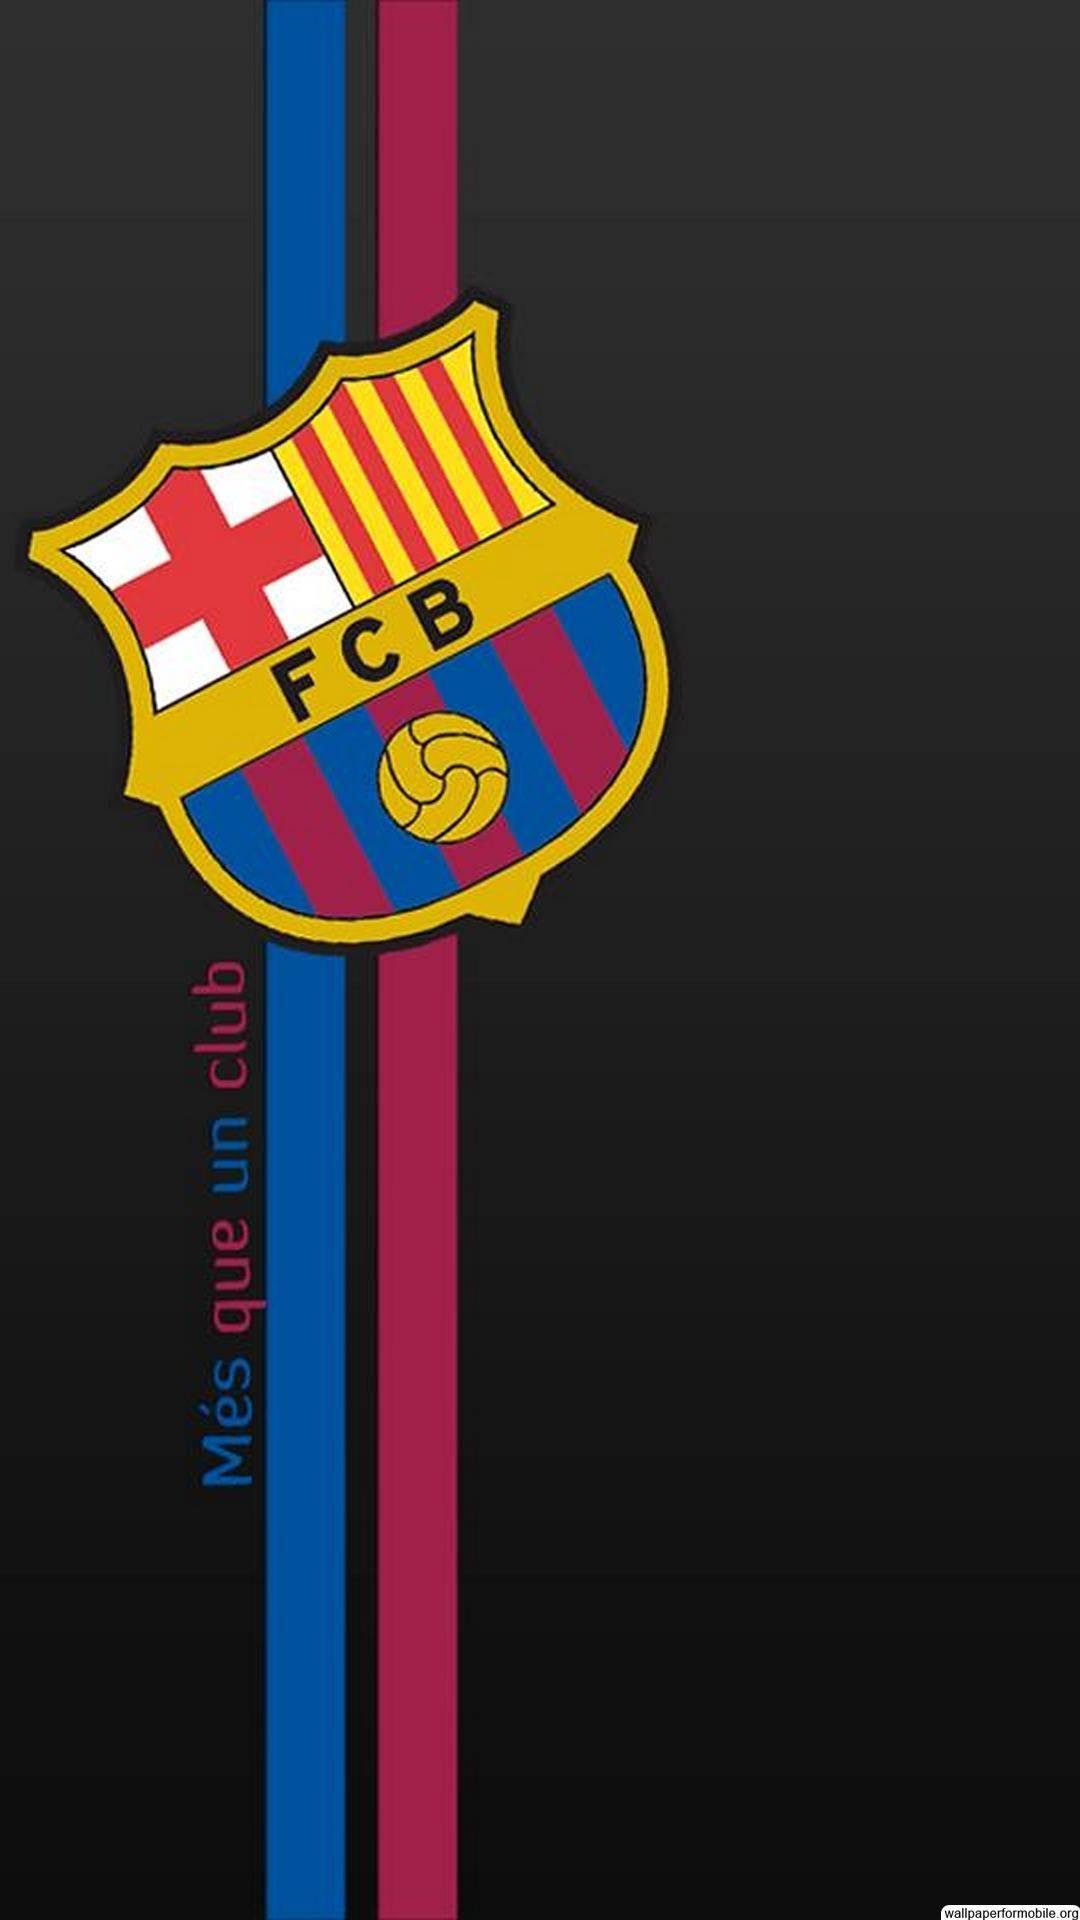 Barcelona Iphone Wallpaper Hd